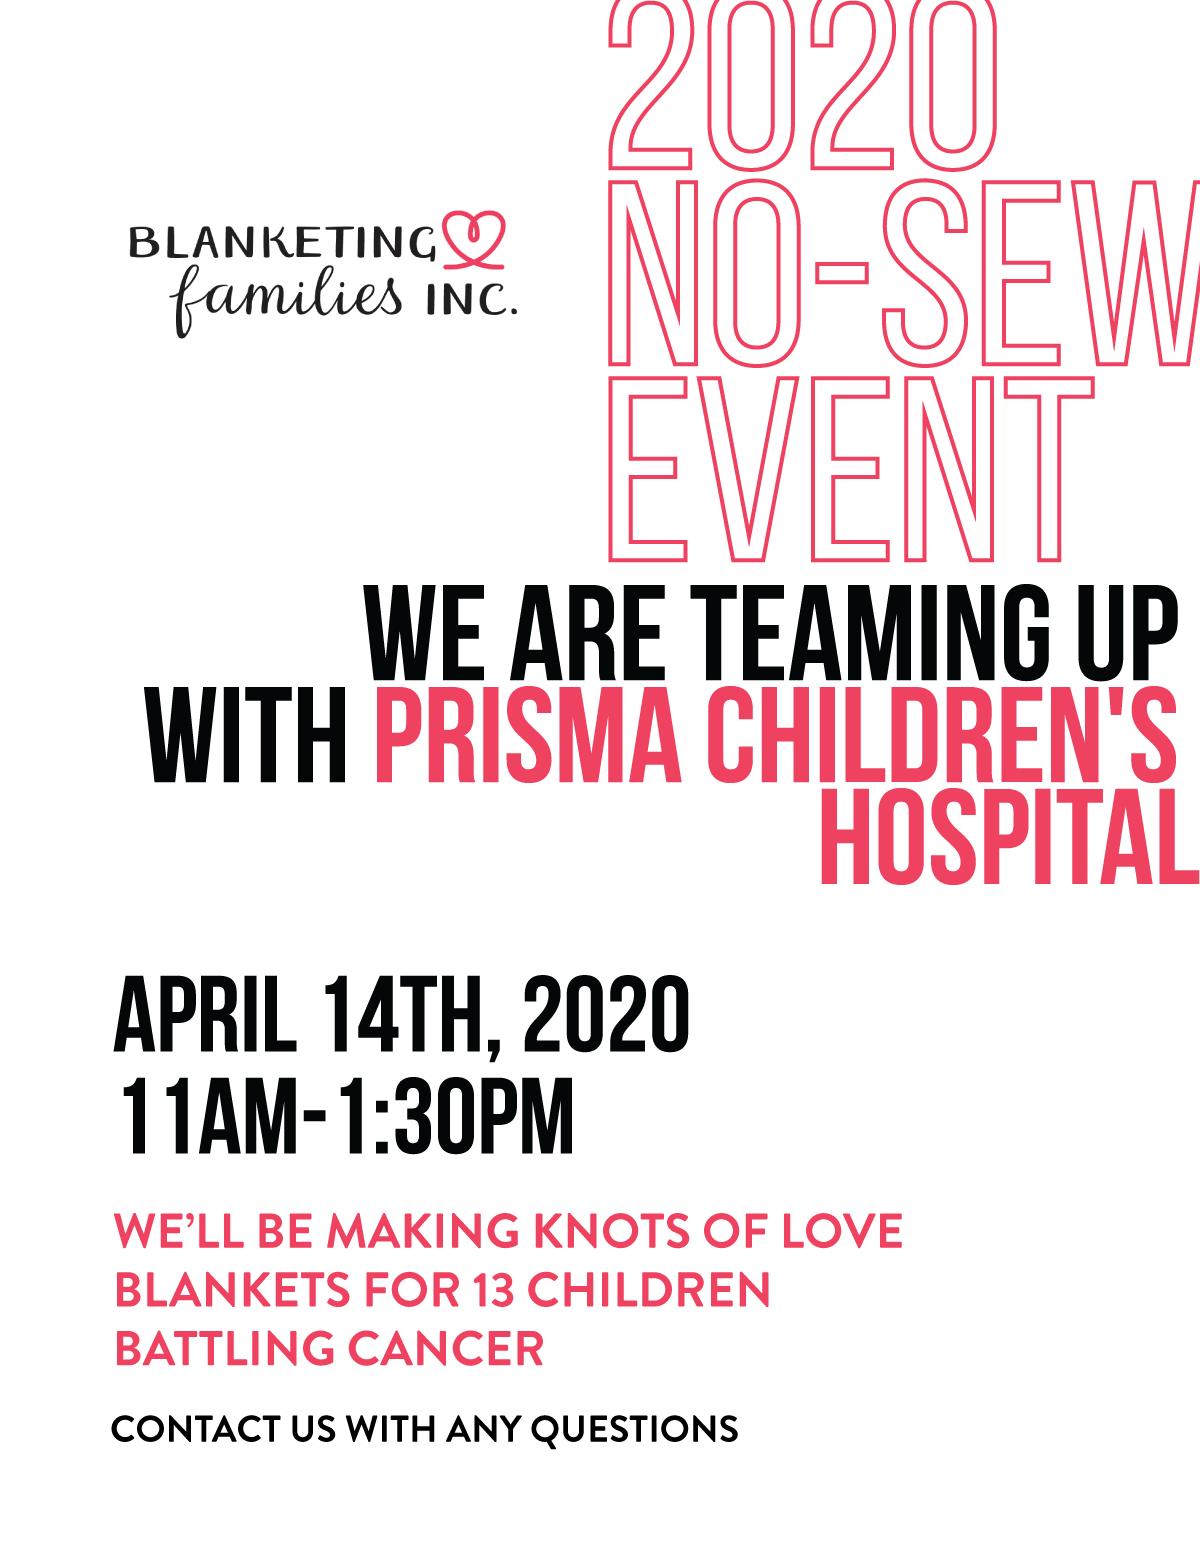 No Sew Blanket Event